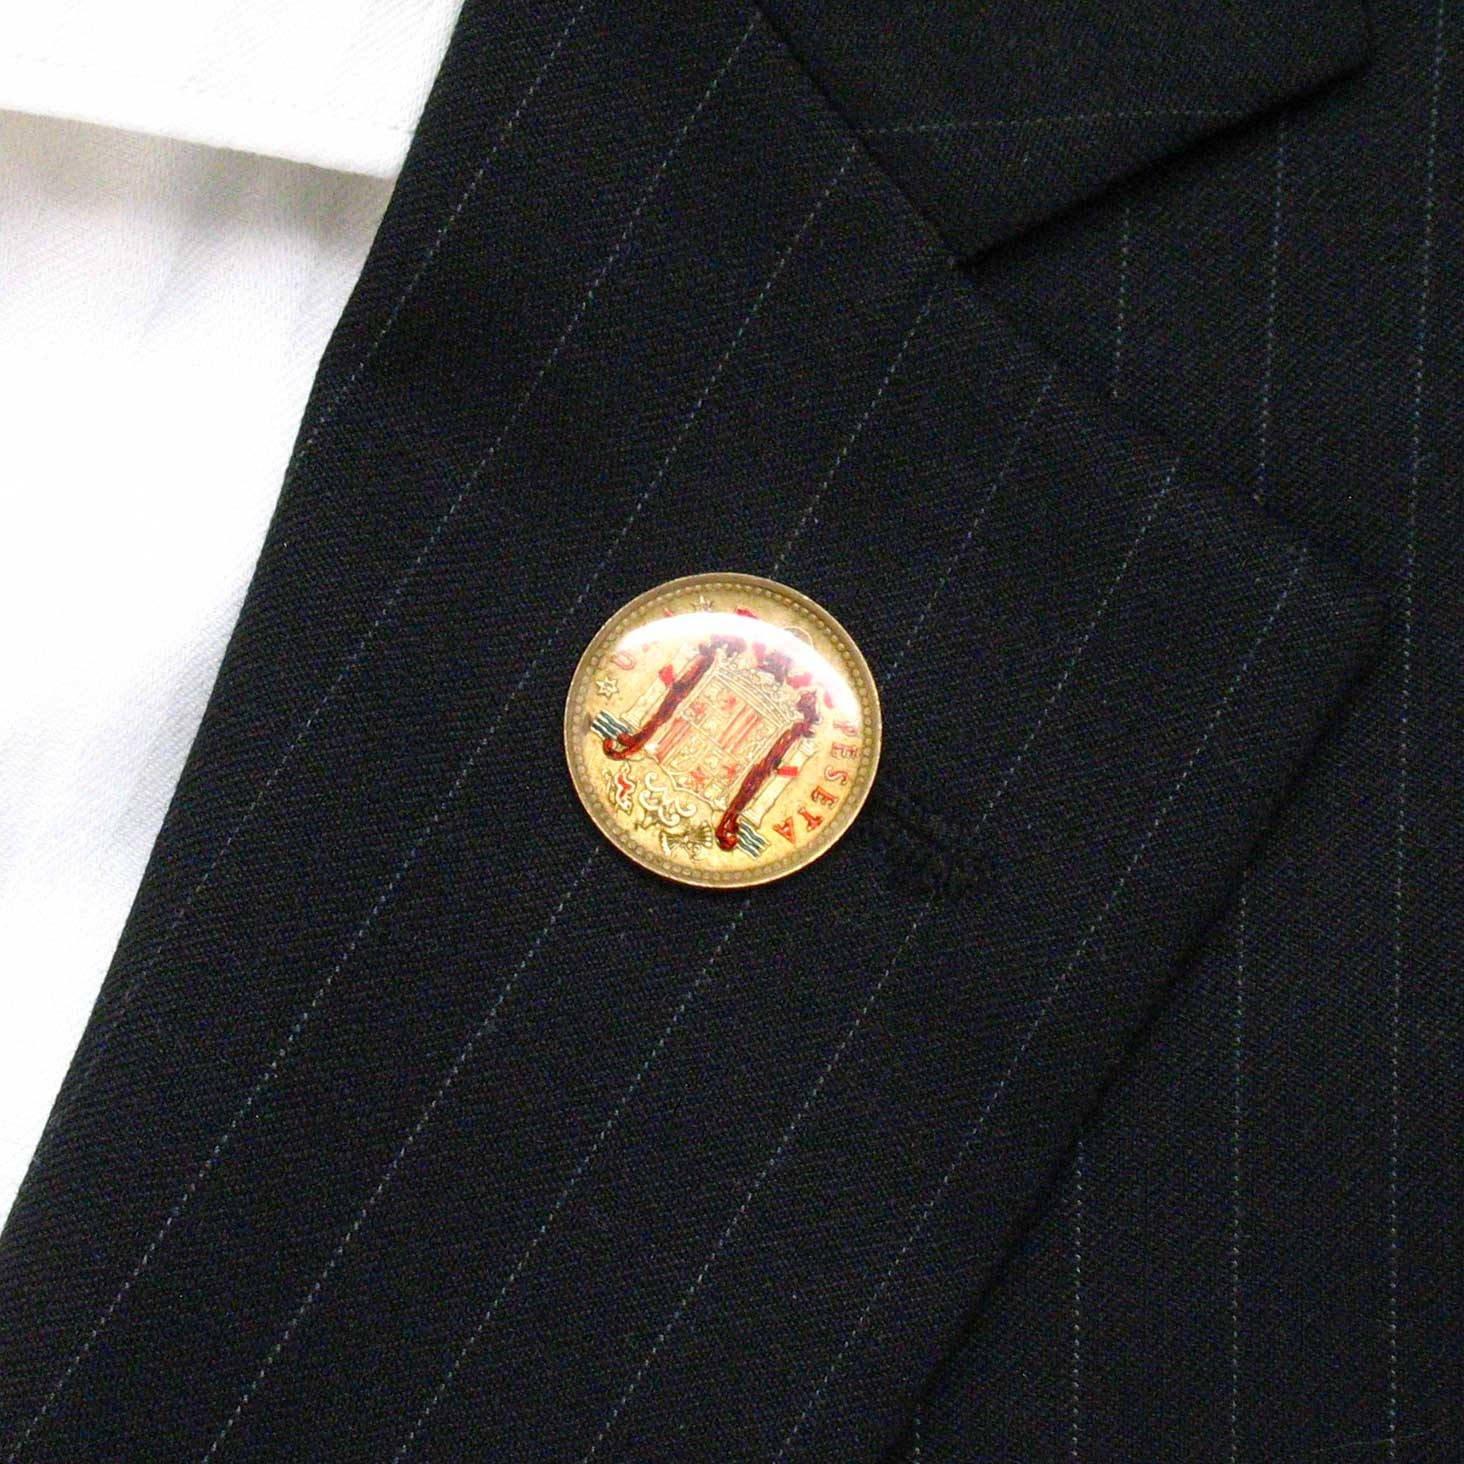 Amazon.com: Spain Coin Tie Tack Lapel Pin Suit Barcelona ...